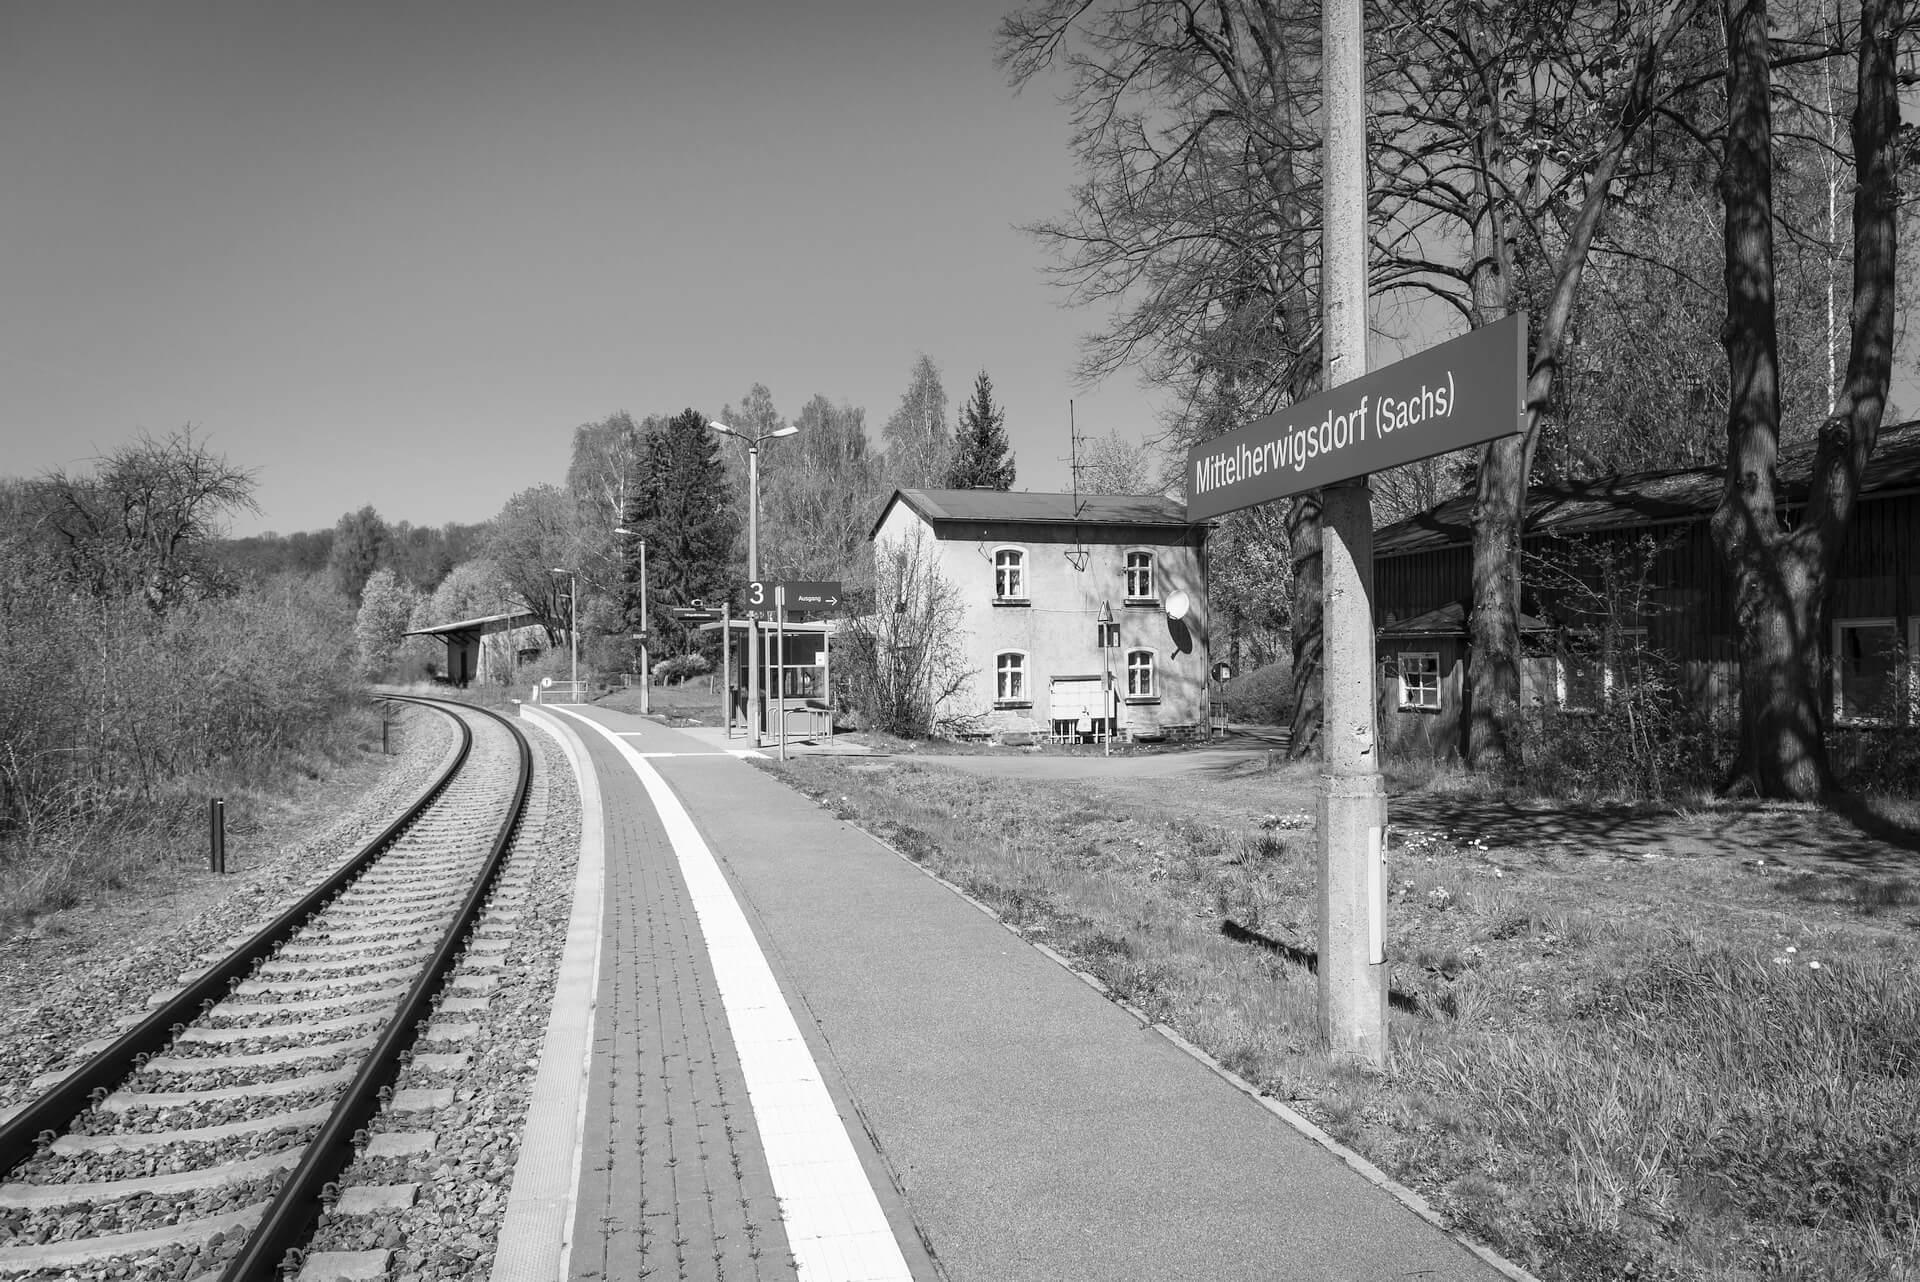 Bahnhof Mittelherwigsdorf